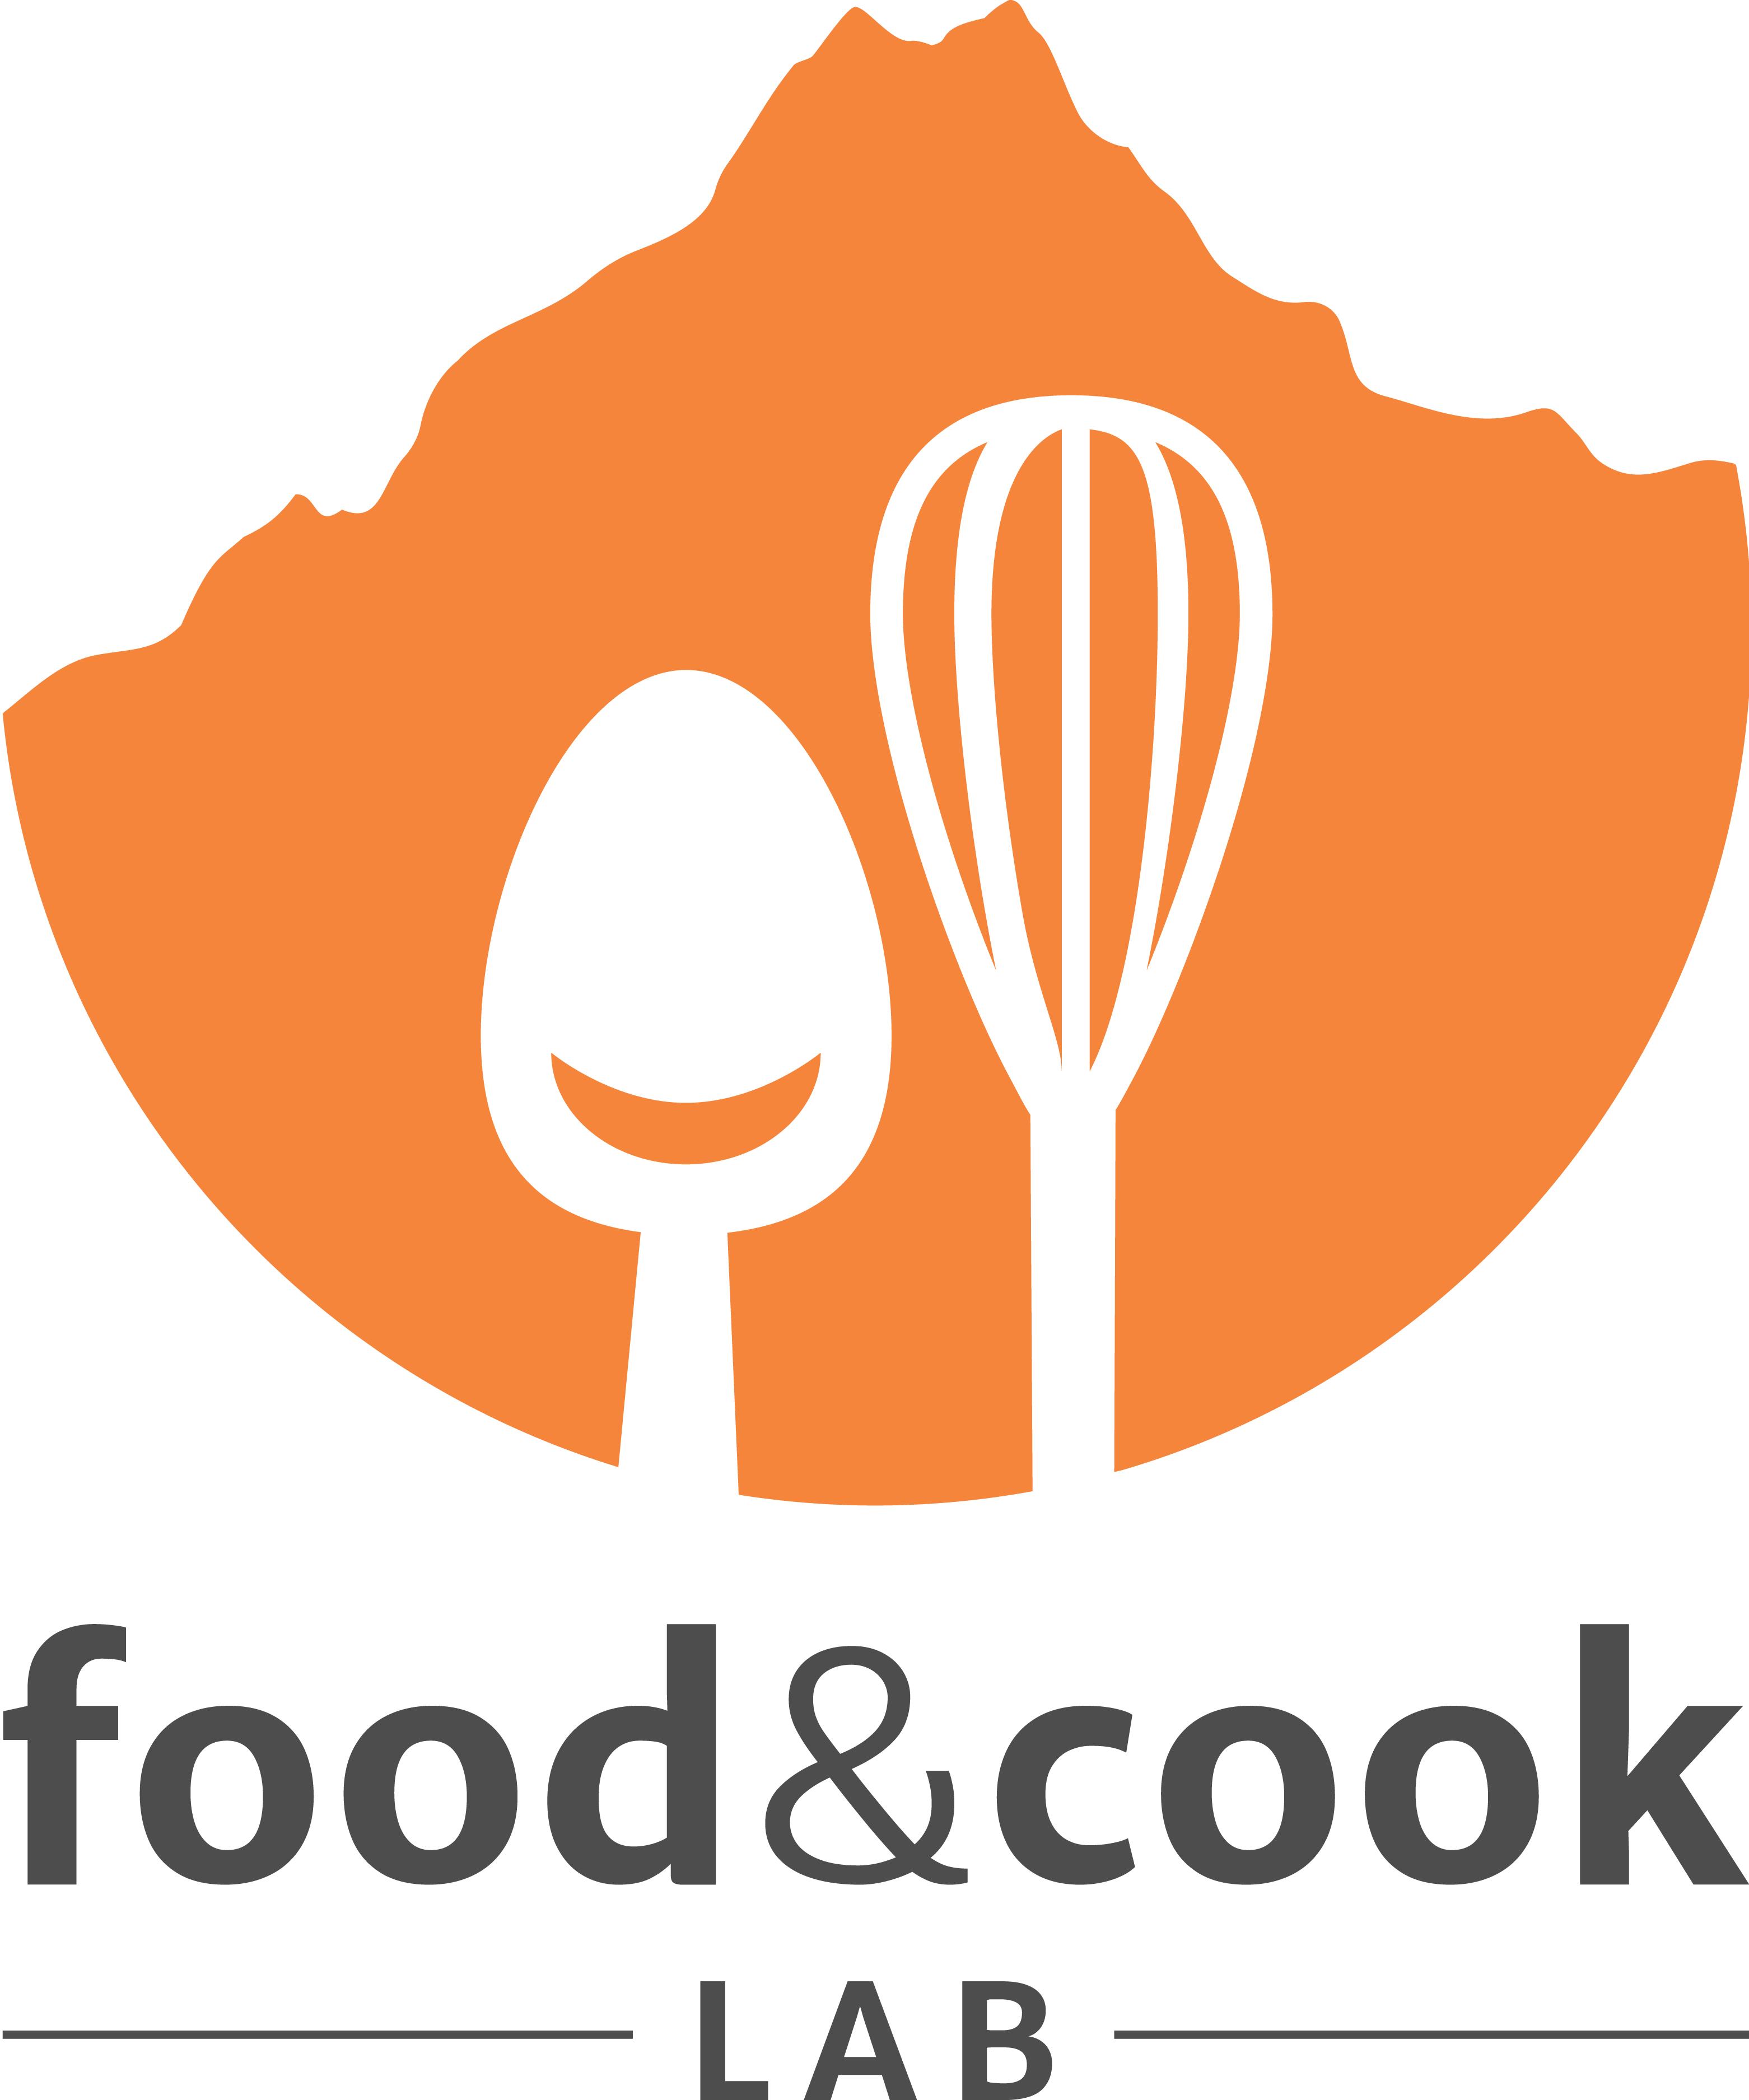 Food&CookLab